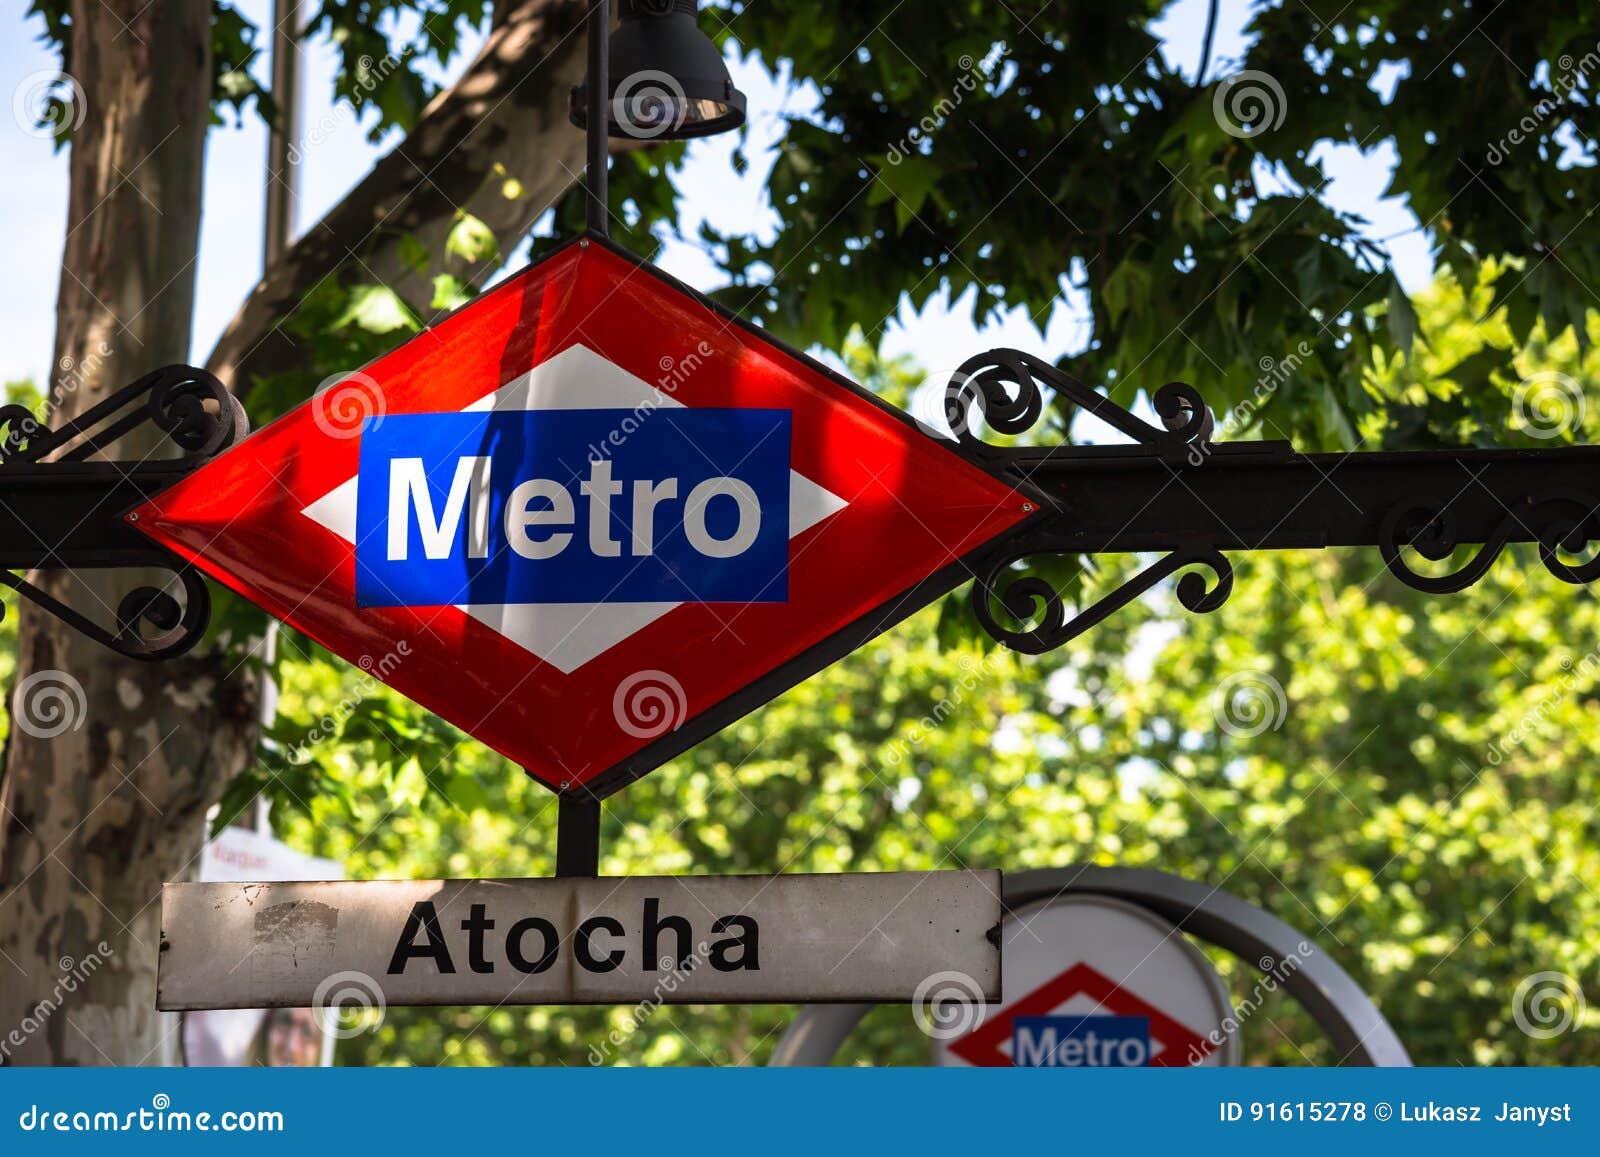 Atocha Metro Station Sign in Madrid Spain